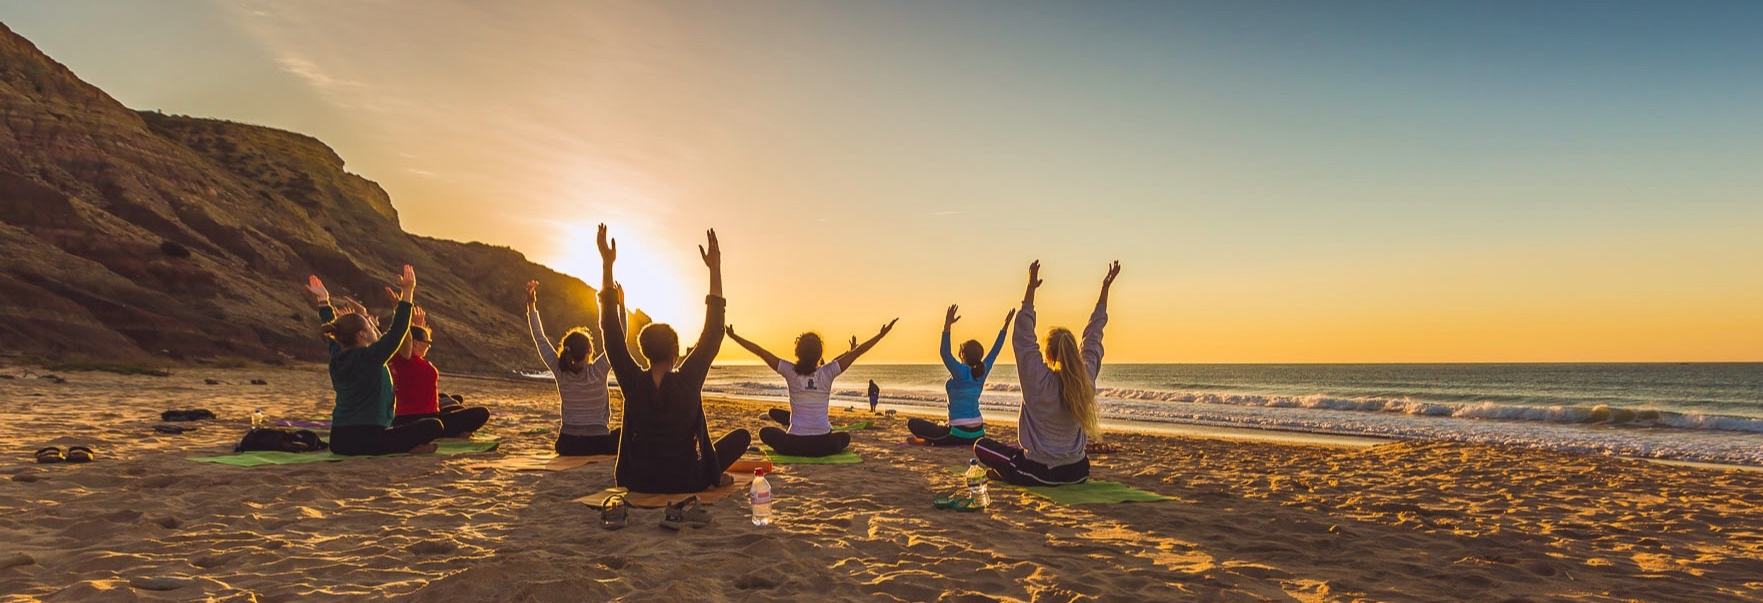 Yoga+beach+sunset+crop.jpg